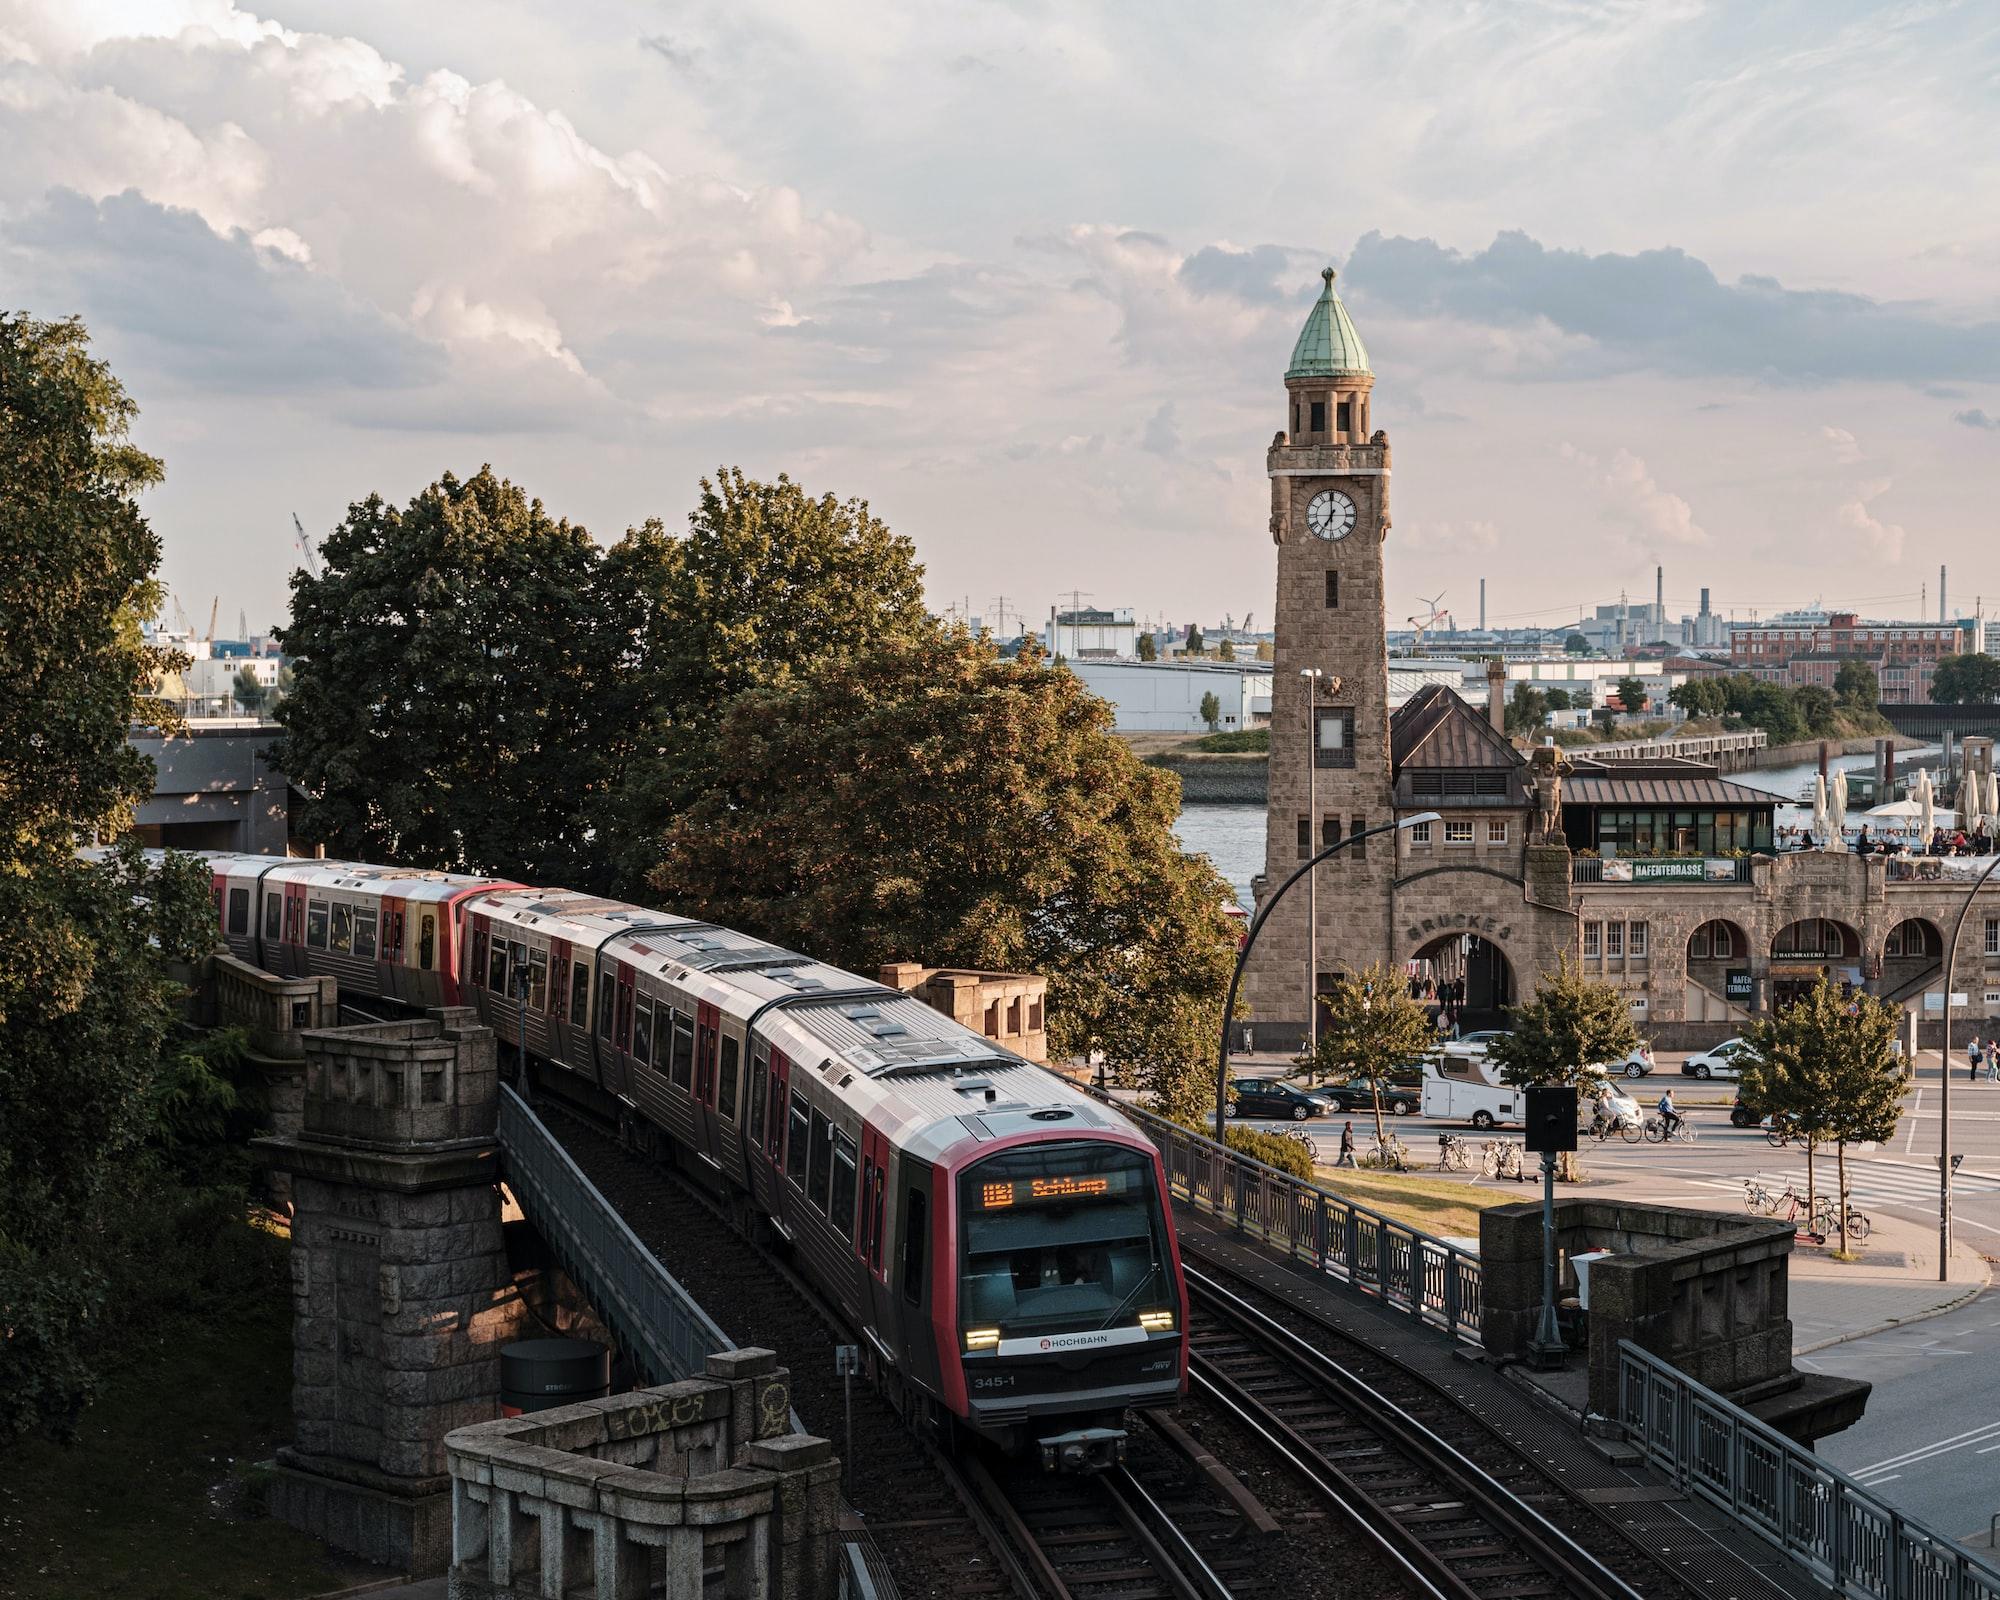 View on Hamburg hochbahn train and Landugsbrücke clock tower from above.